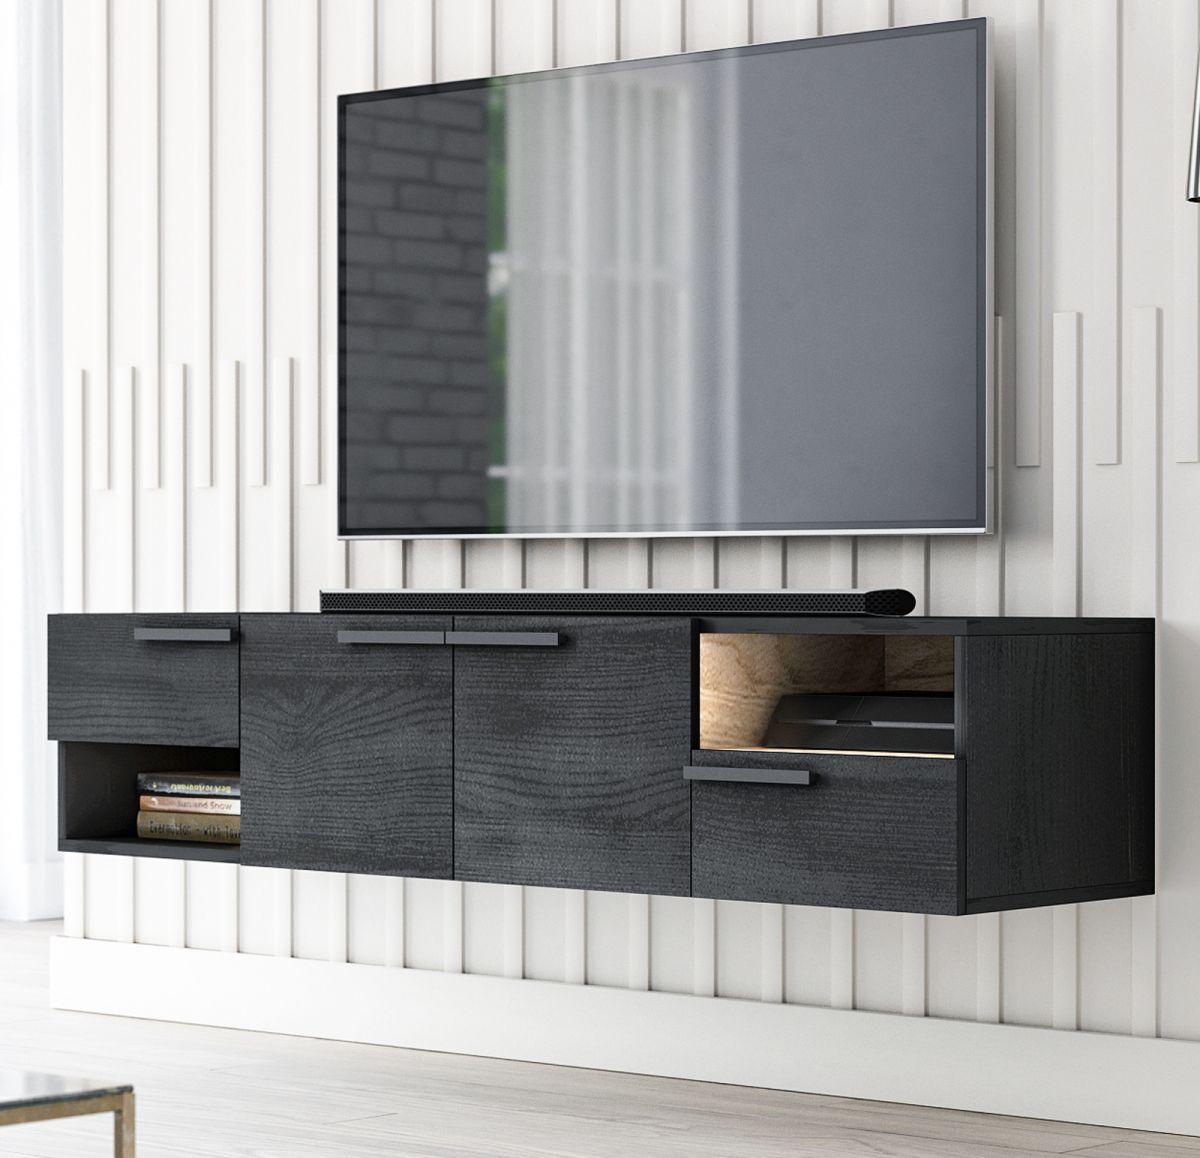 TV-Lowboard Odino in Black North und Eiche Gold 140 cm